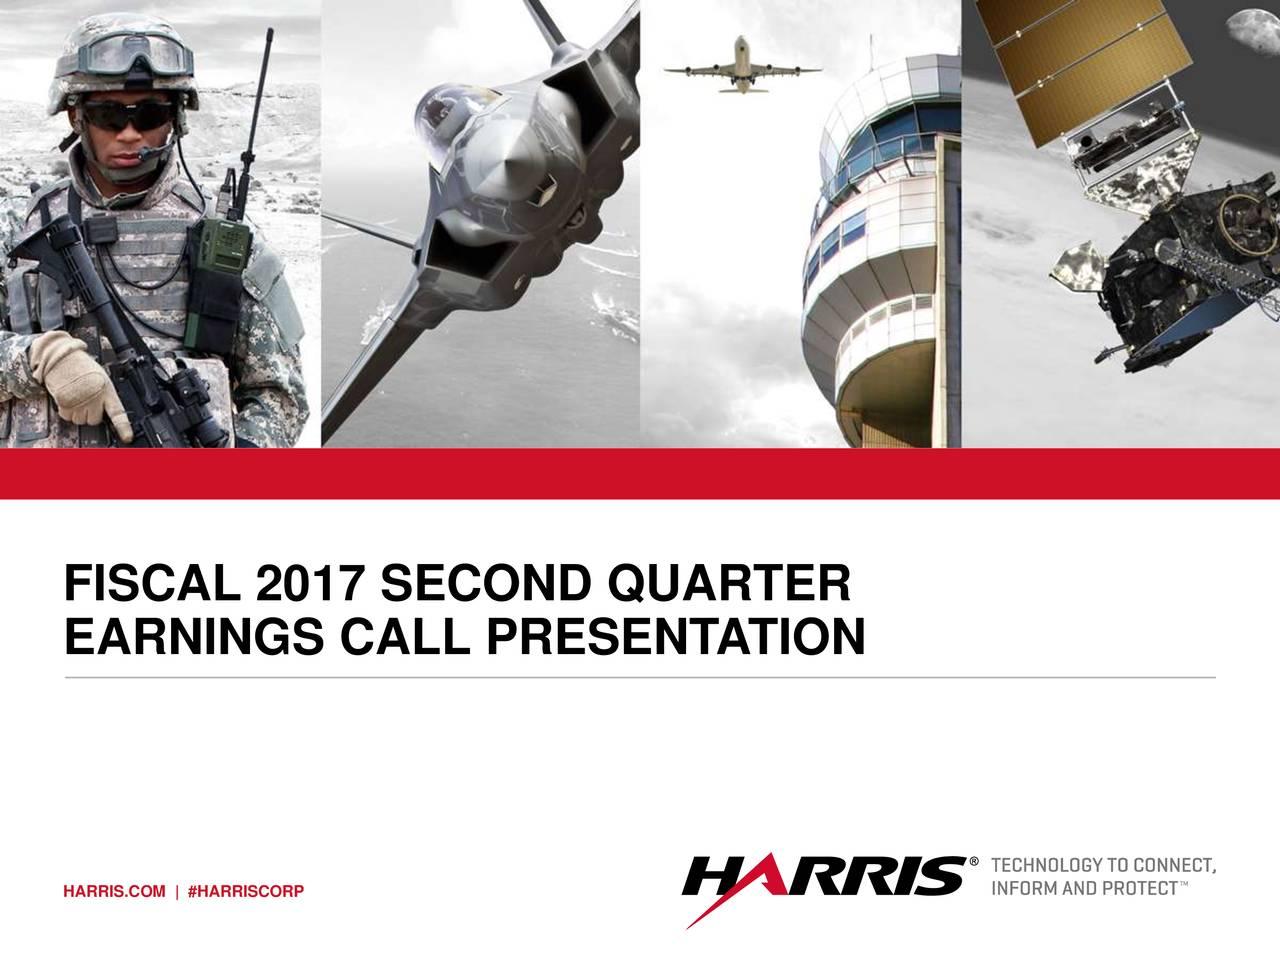 (10 x 3.5) FISCAL 2017 SECOND QUARTER EARNINGS CALL PRESENTATION HARRIS.COM | #HARRISCORP